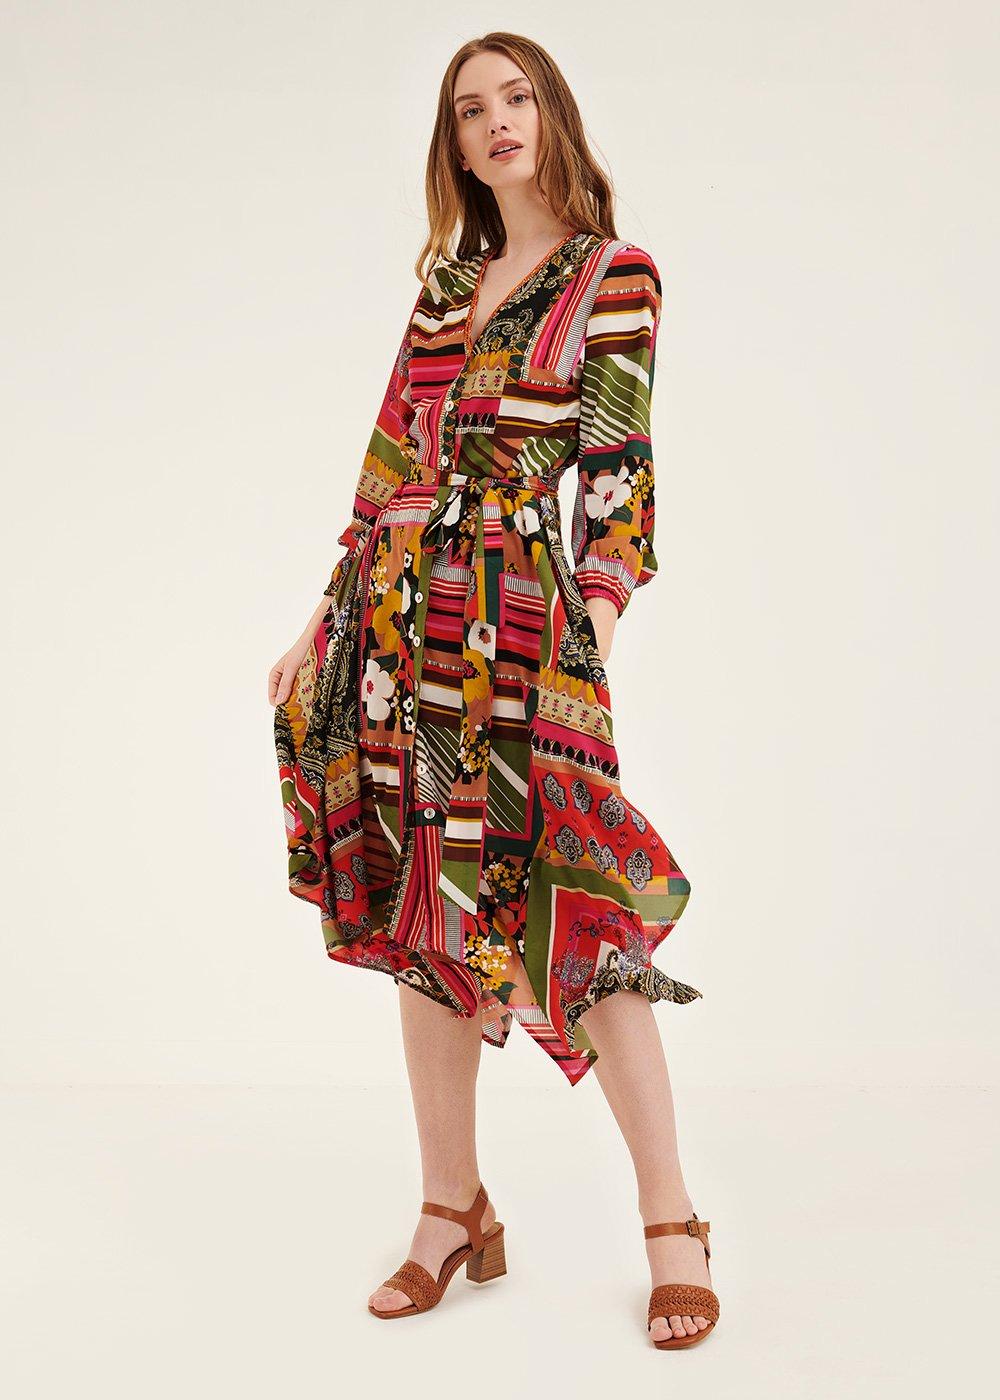 Aydan patterned dress - Aragosta\ Timo\ Fantasia - Woman